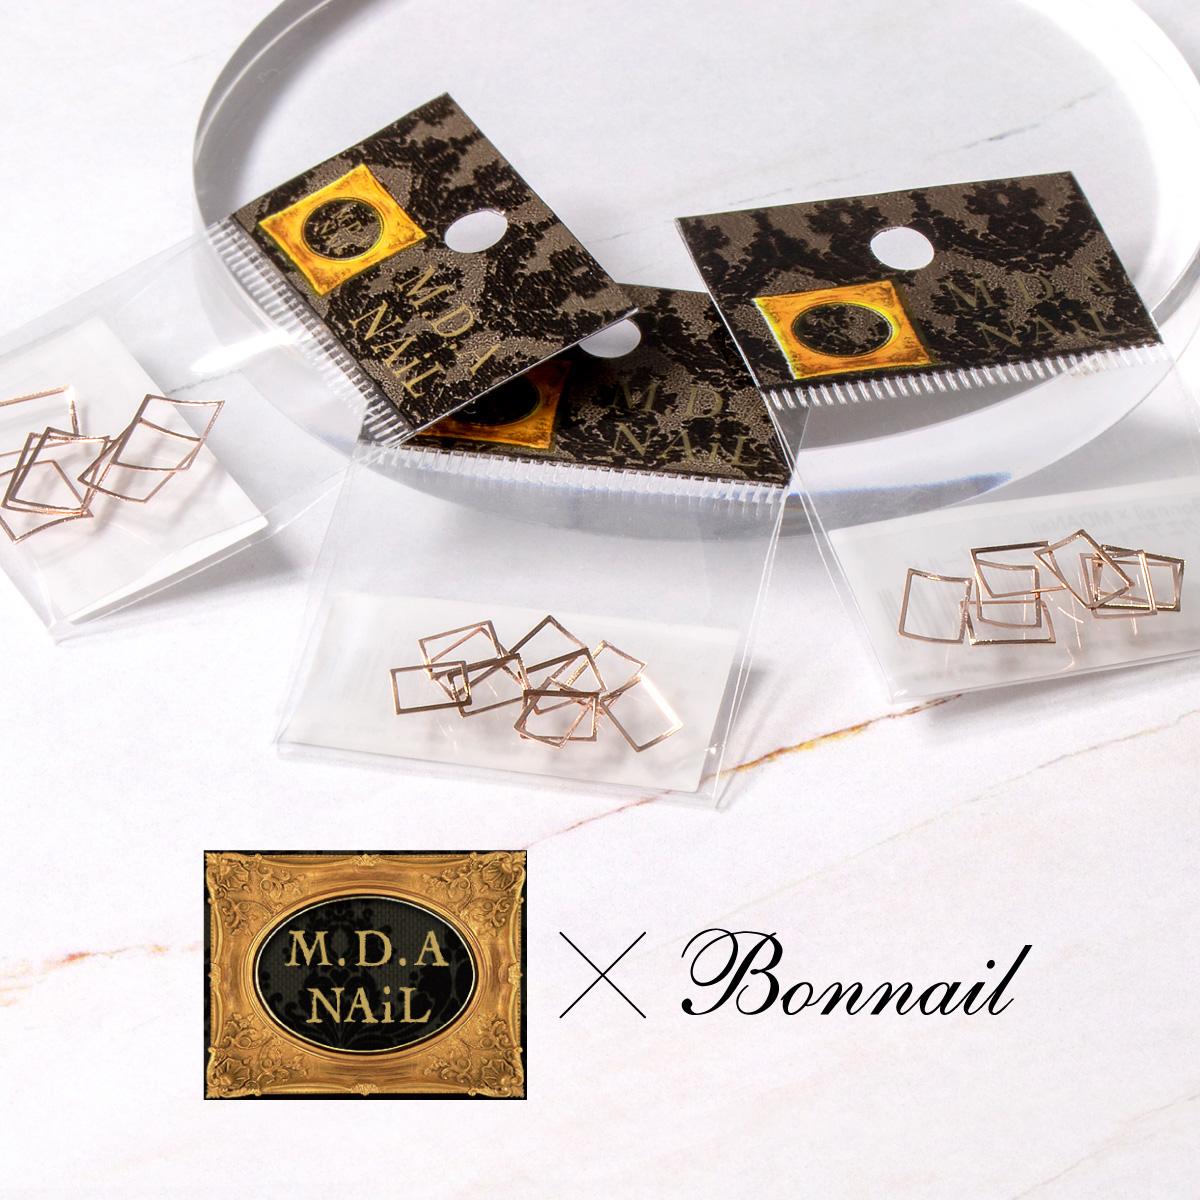 Bonnail×MDANail ボンネイル 買い取り ジェルネイル パーツ メタル フレーム 最安値に挑戦 中抜き@Bonnail×MDANail スクエアフォーカス @865261 ピンクゴールド